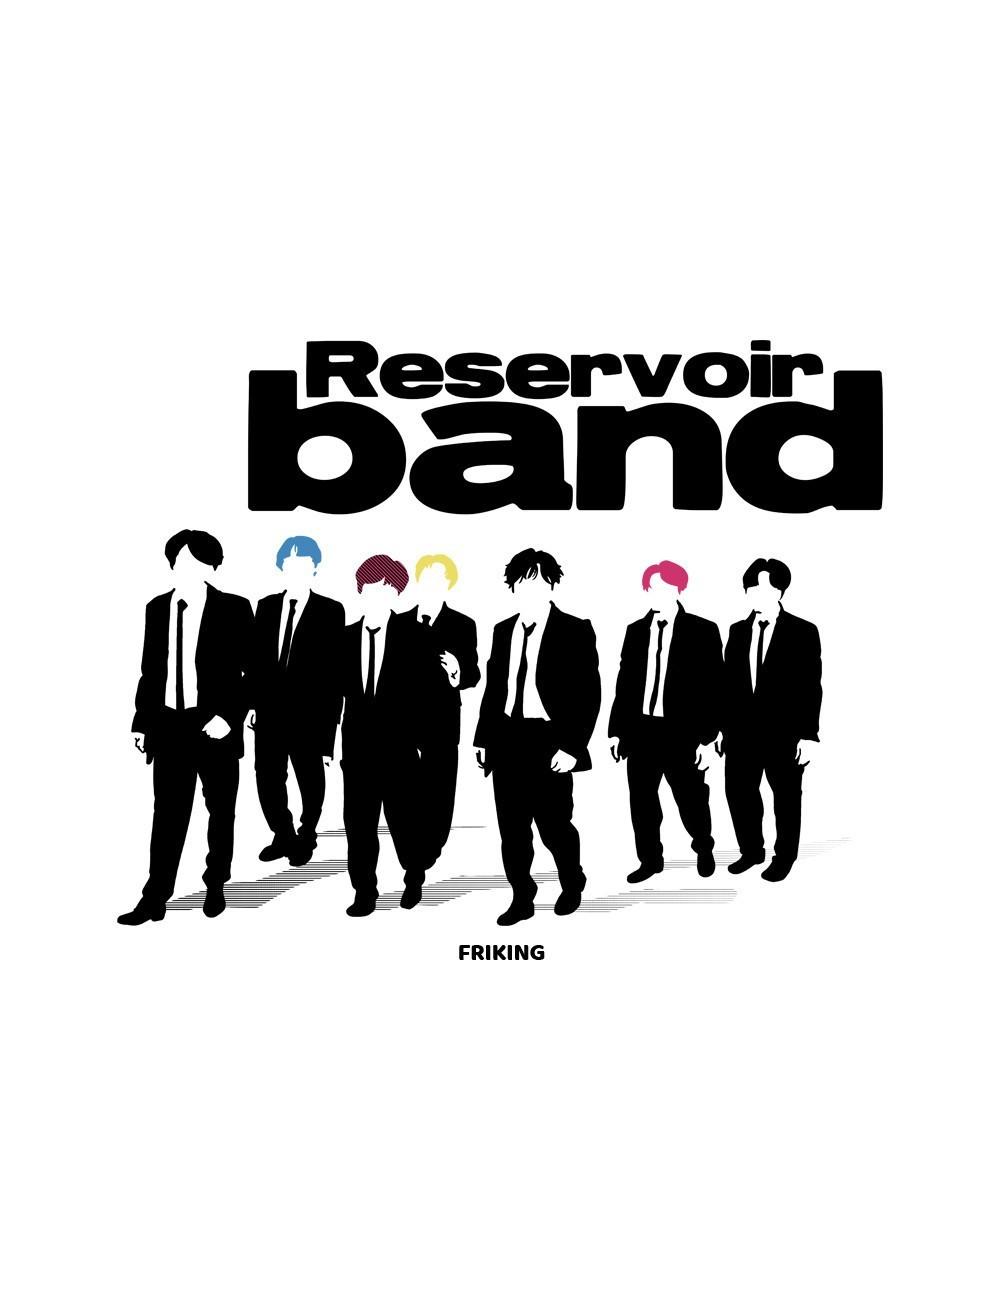 Reservoid band